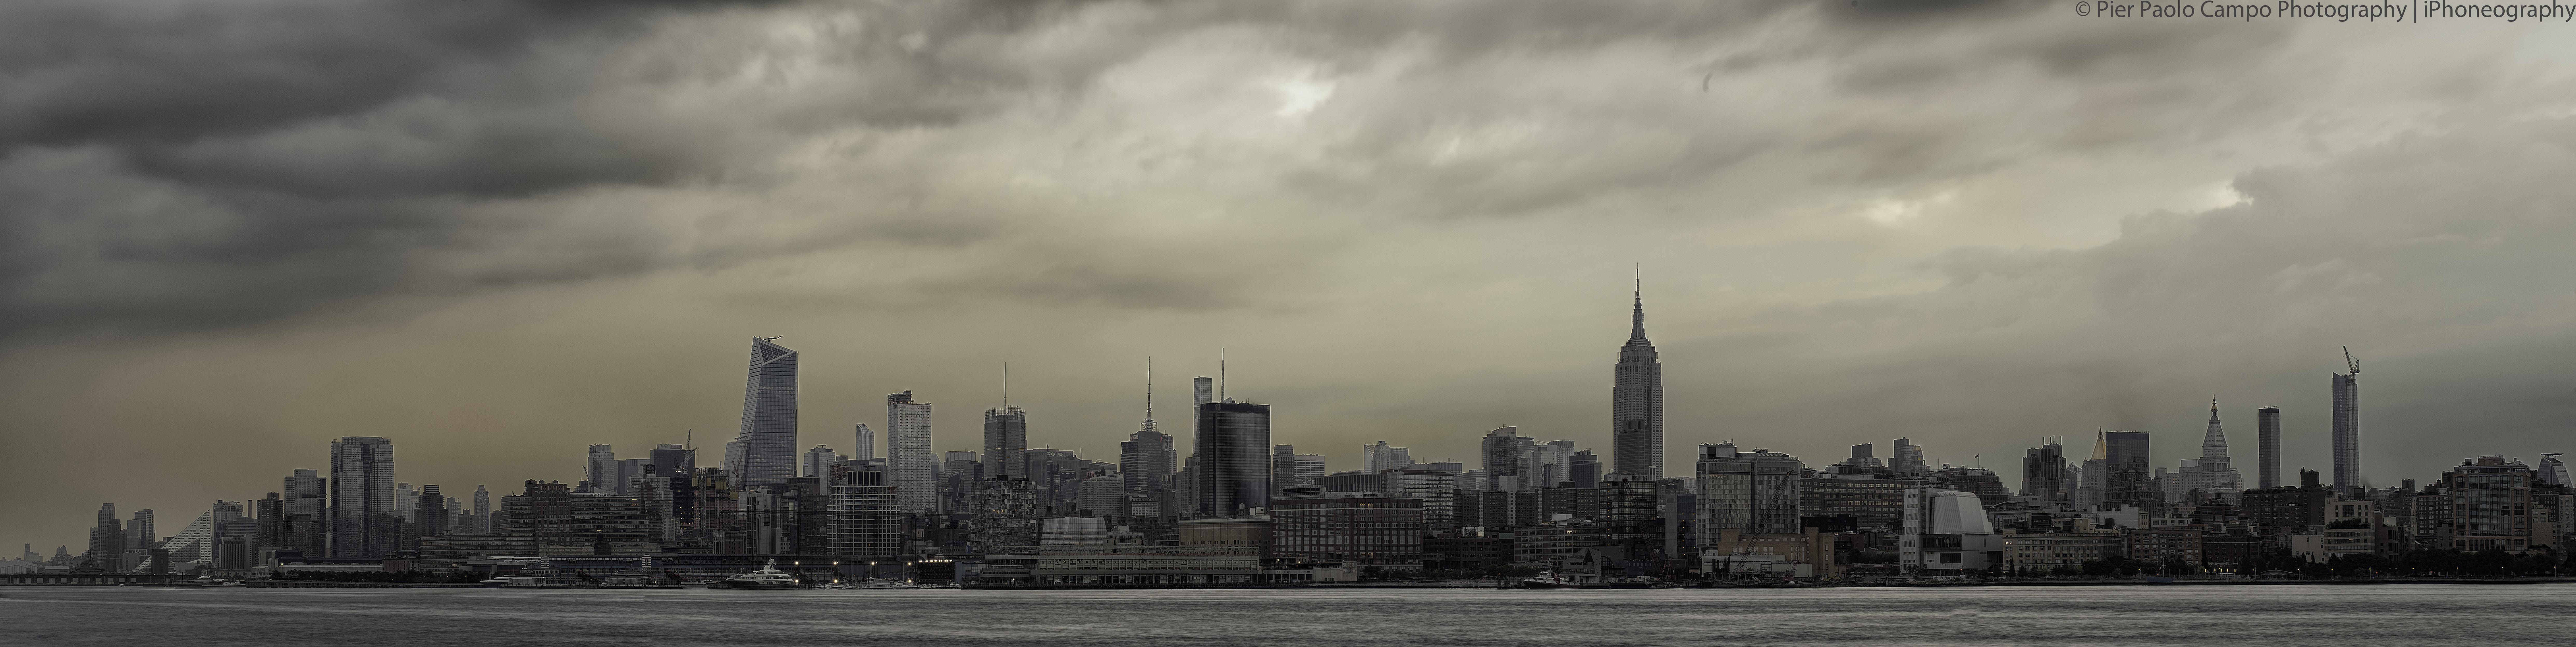 West Midtown Manhattan, NY